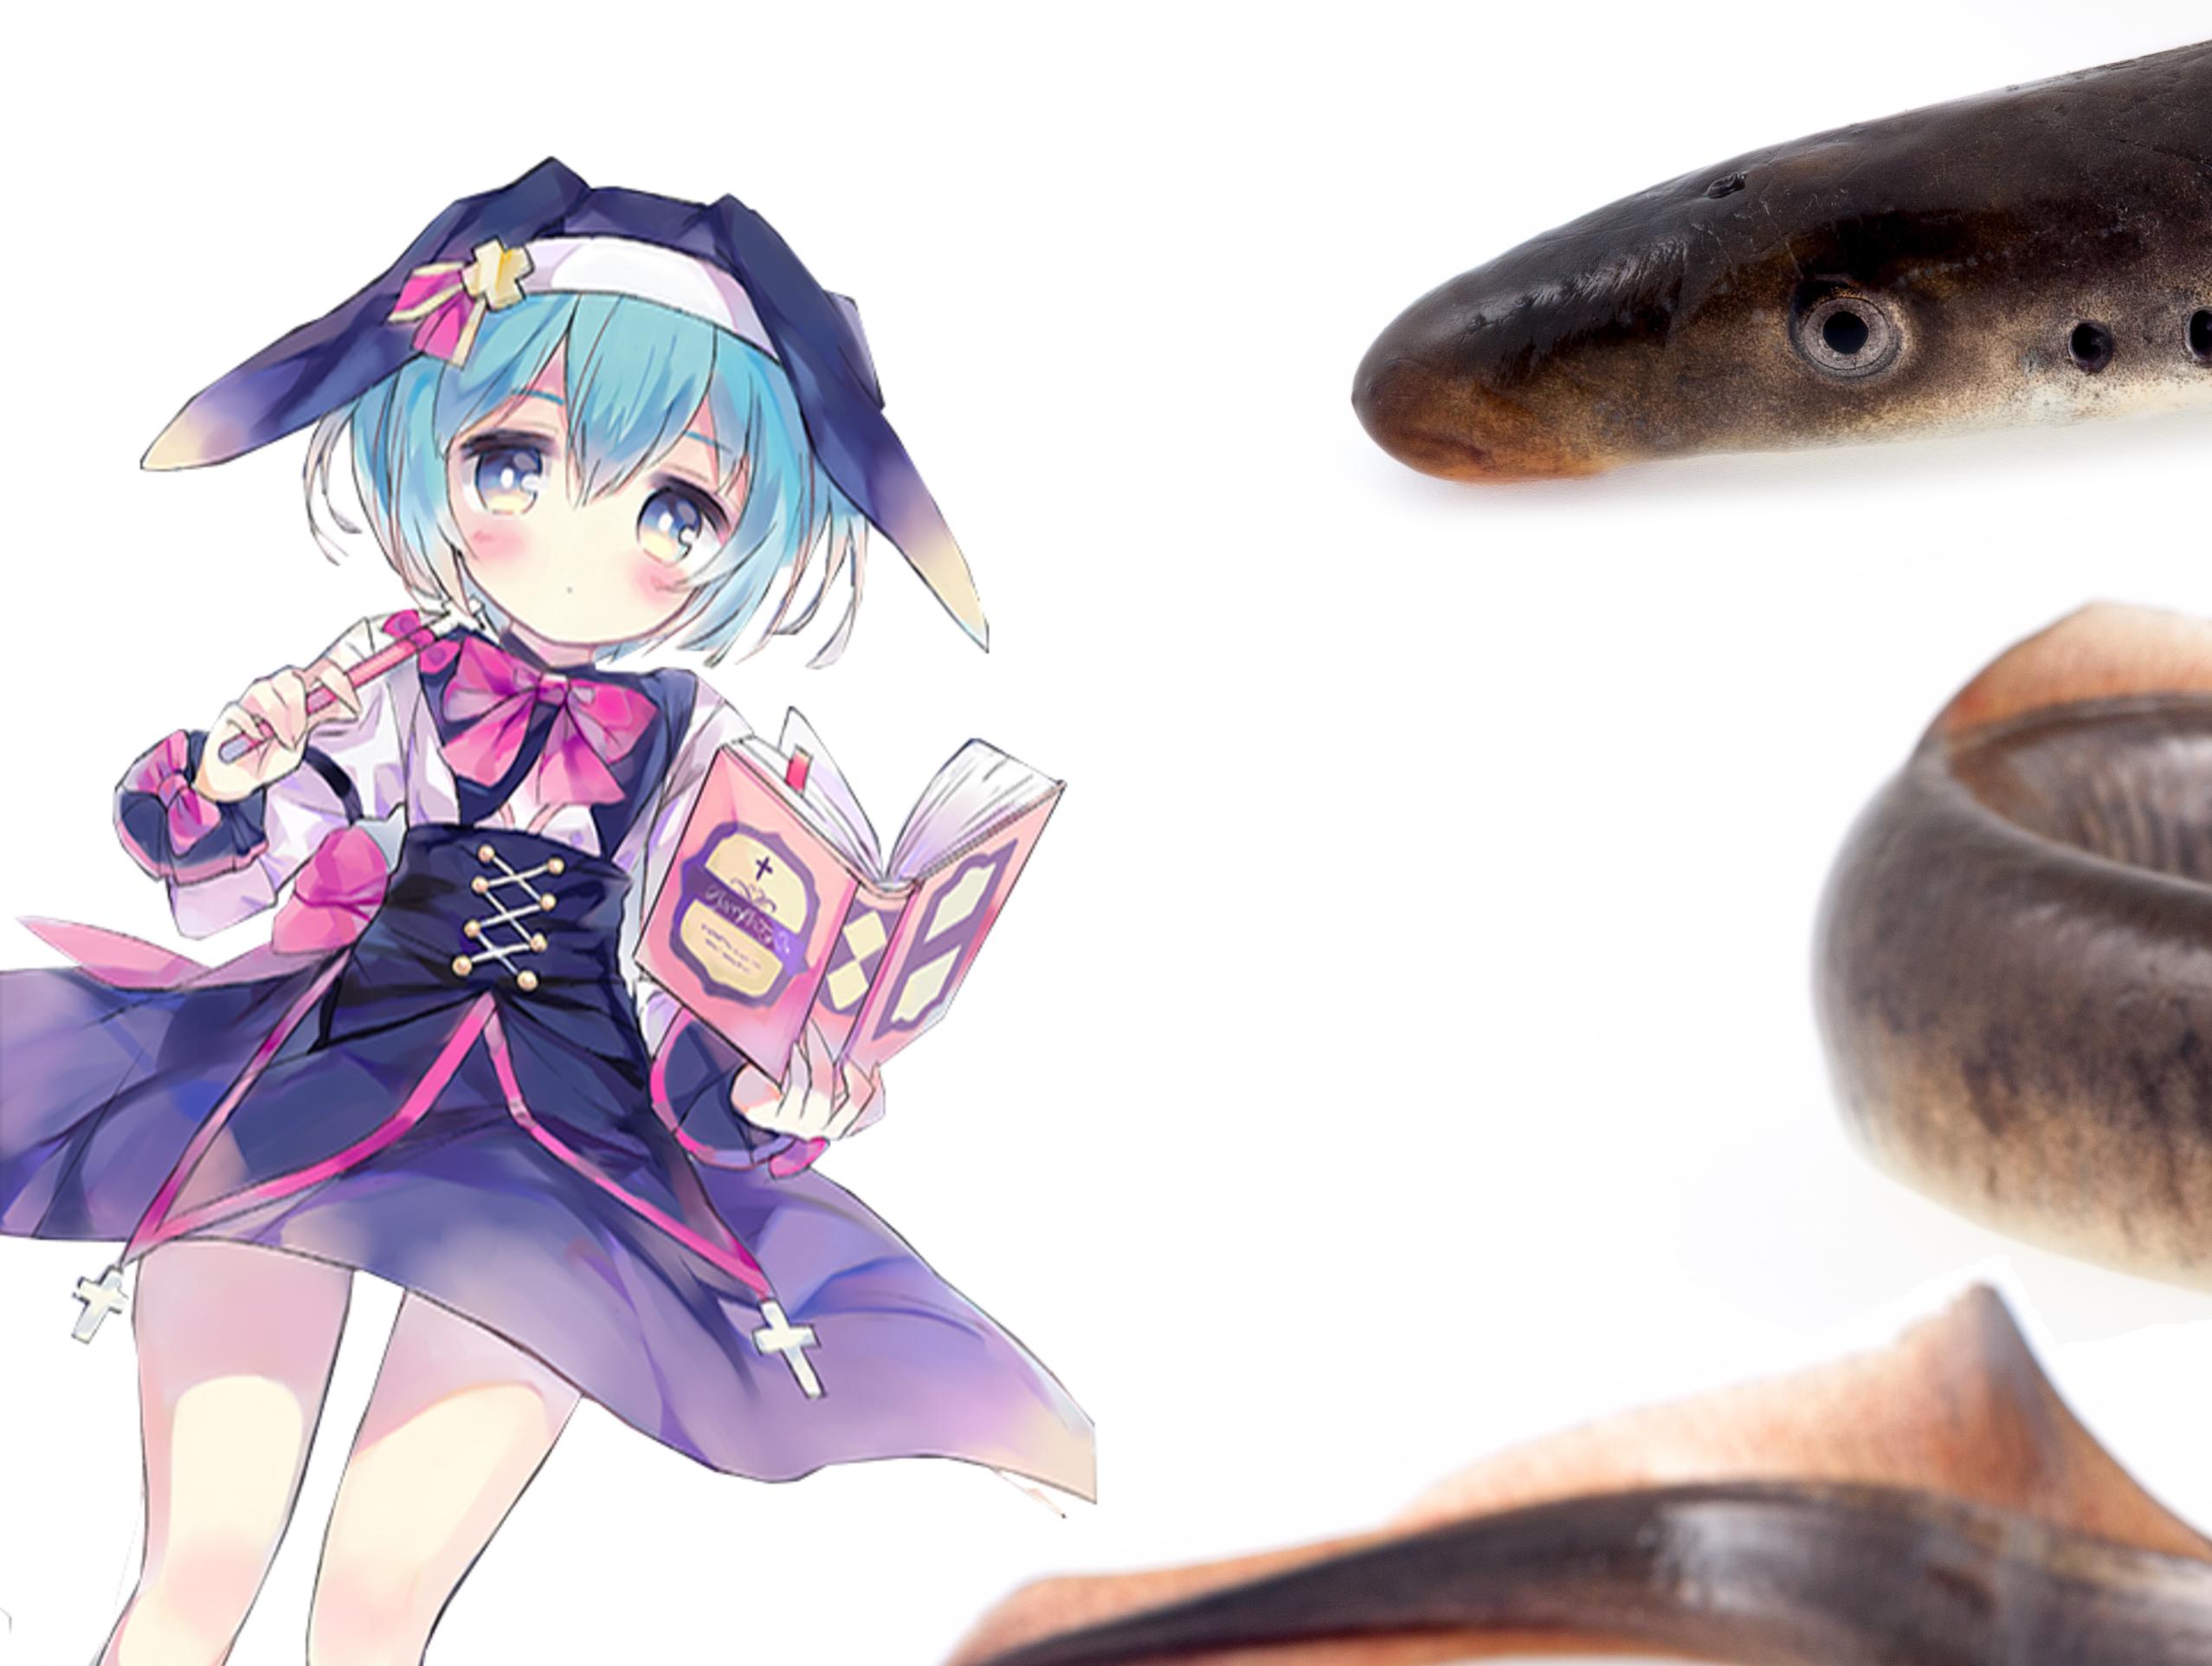 Sticker kikoojap anime fille lamproie relation hote parasite poisson